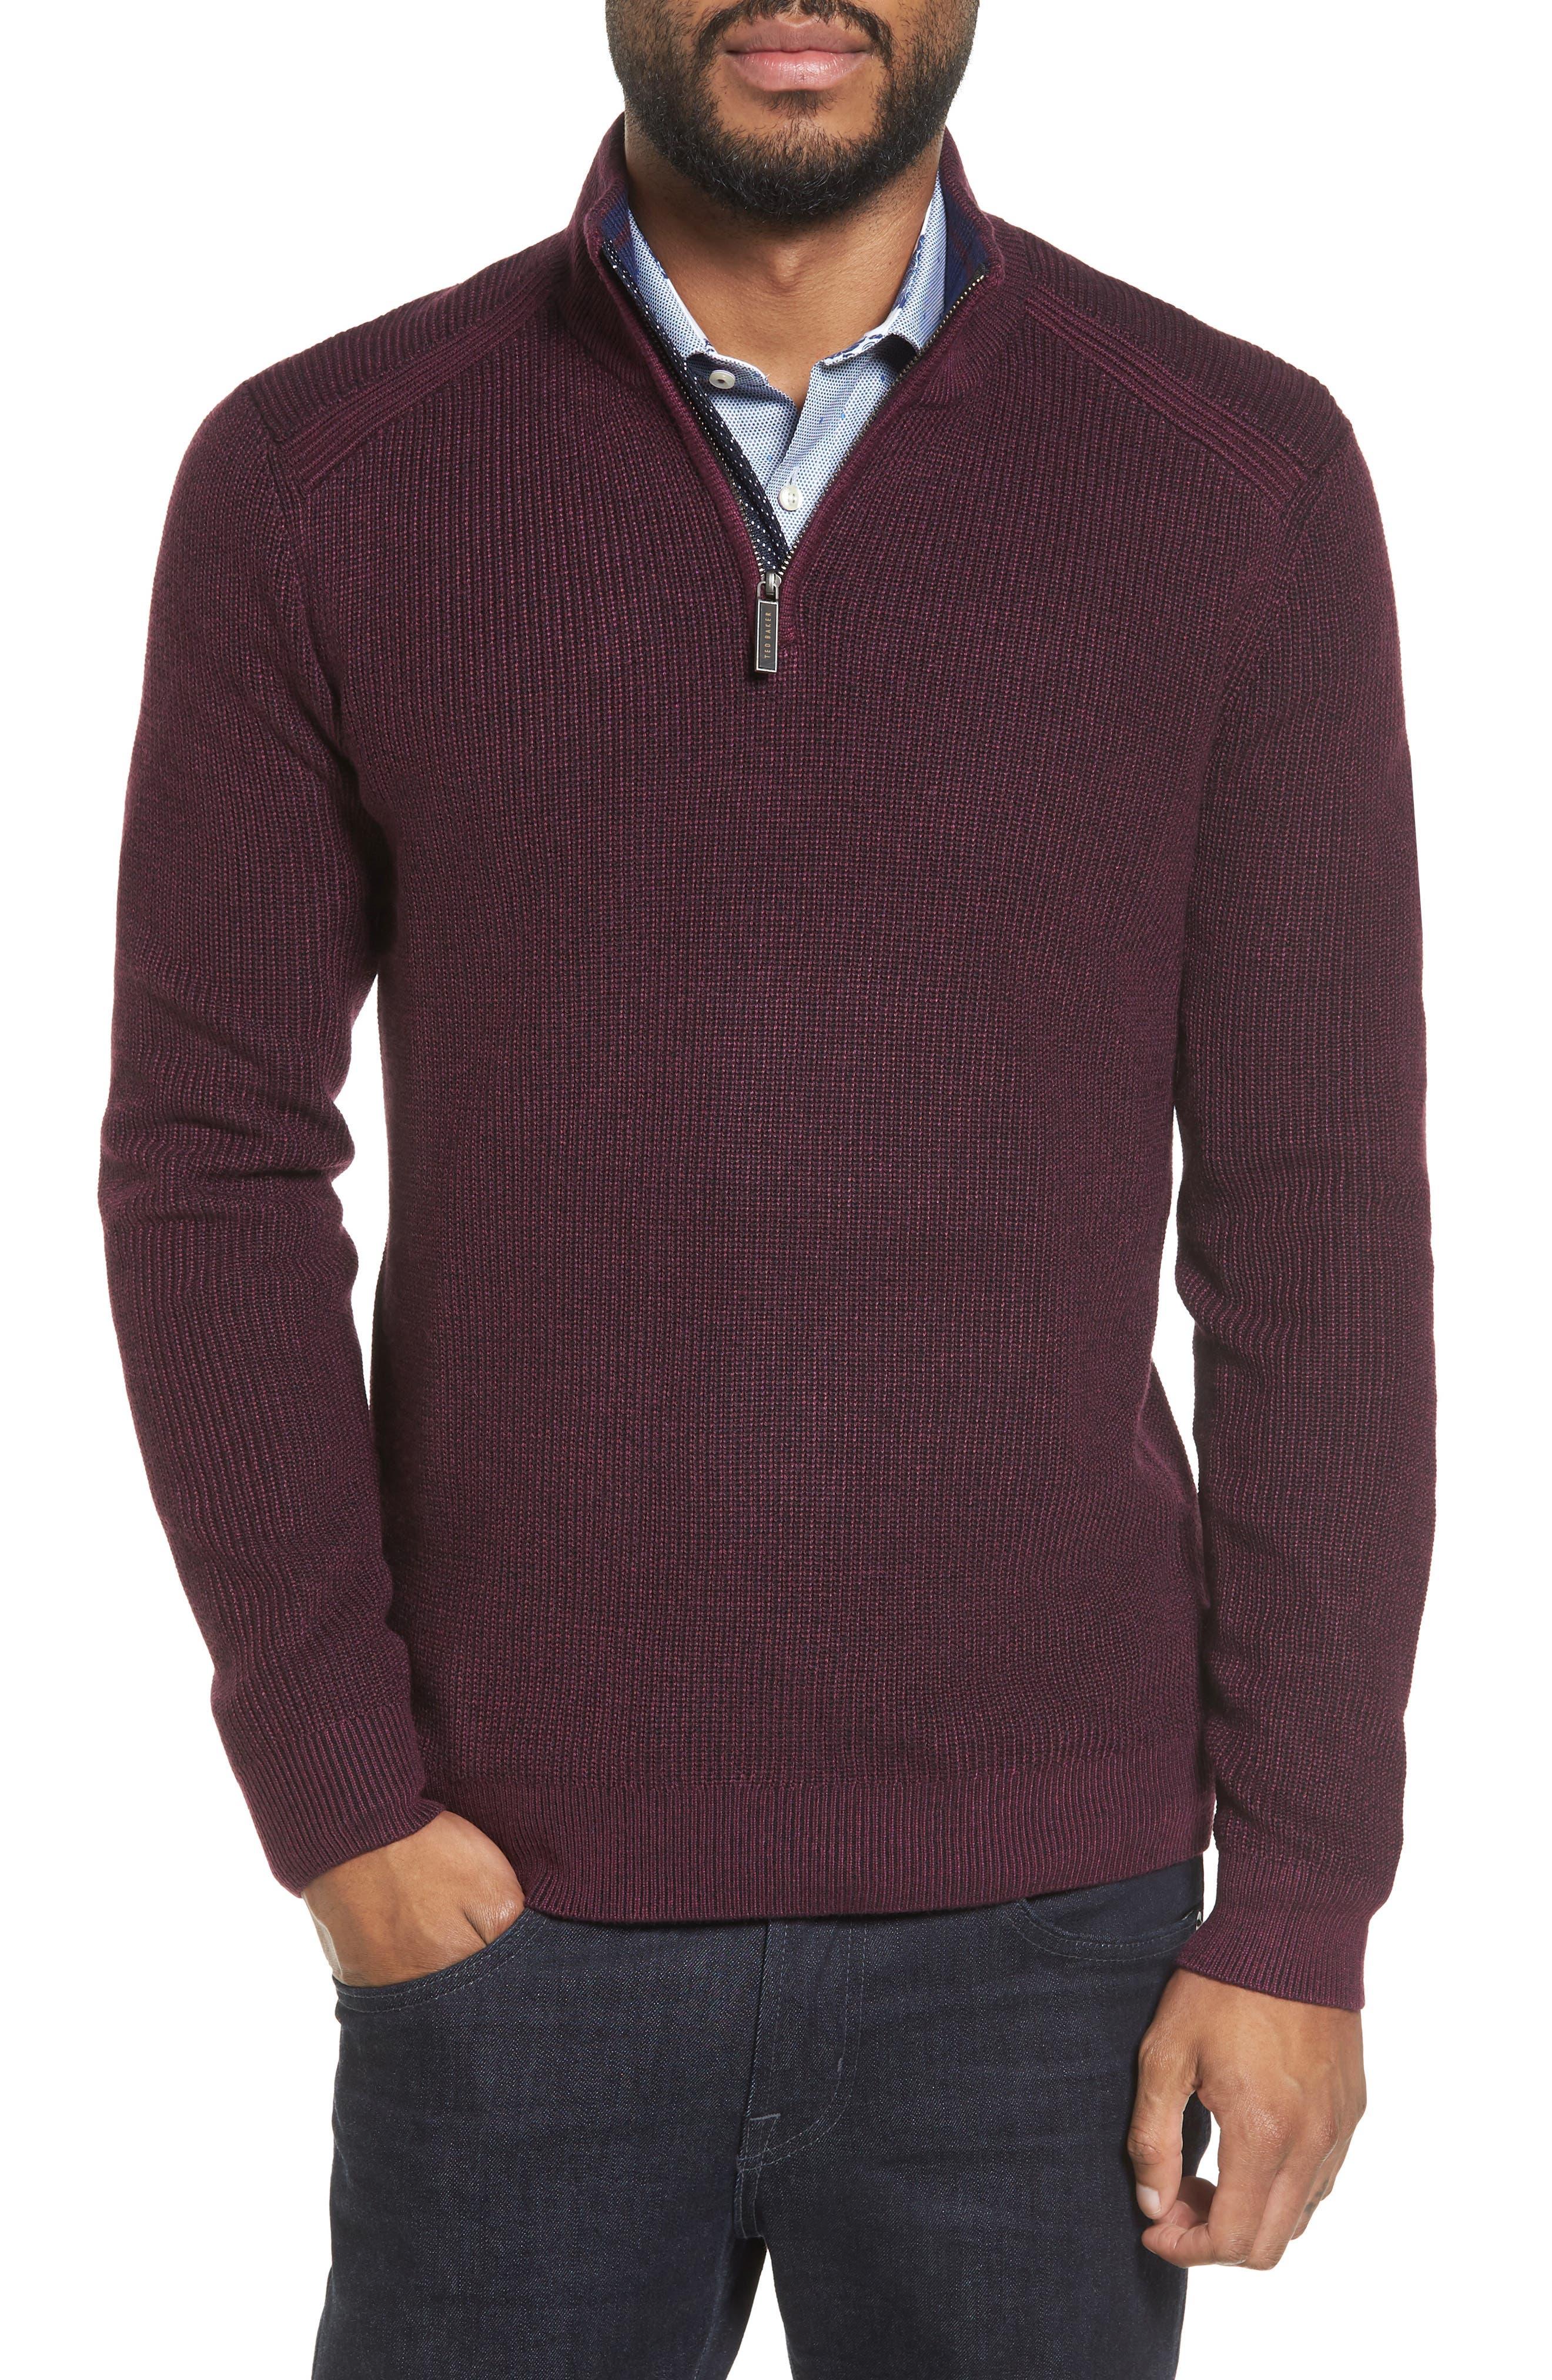 Stach Quarter Zip Sweater,                         Main,                         color, Purple